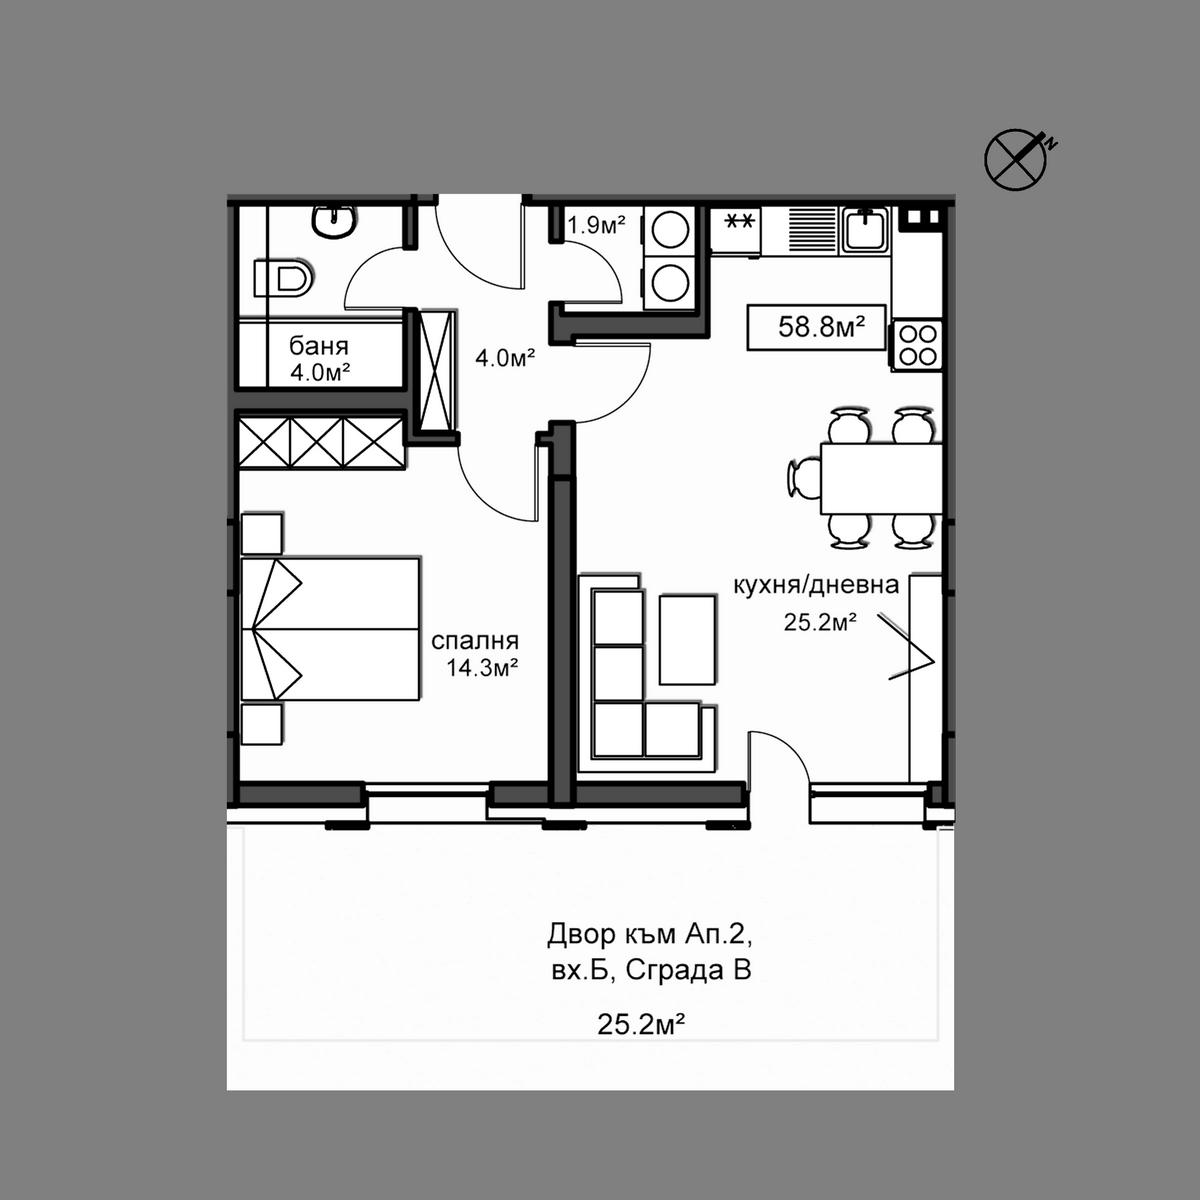 Апартамент Б2